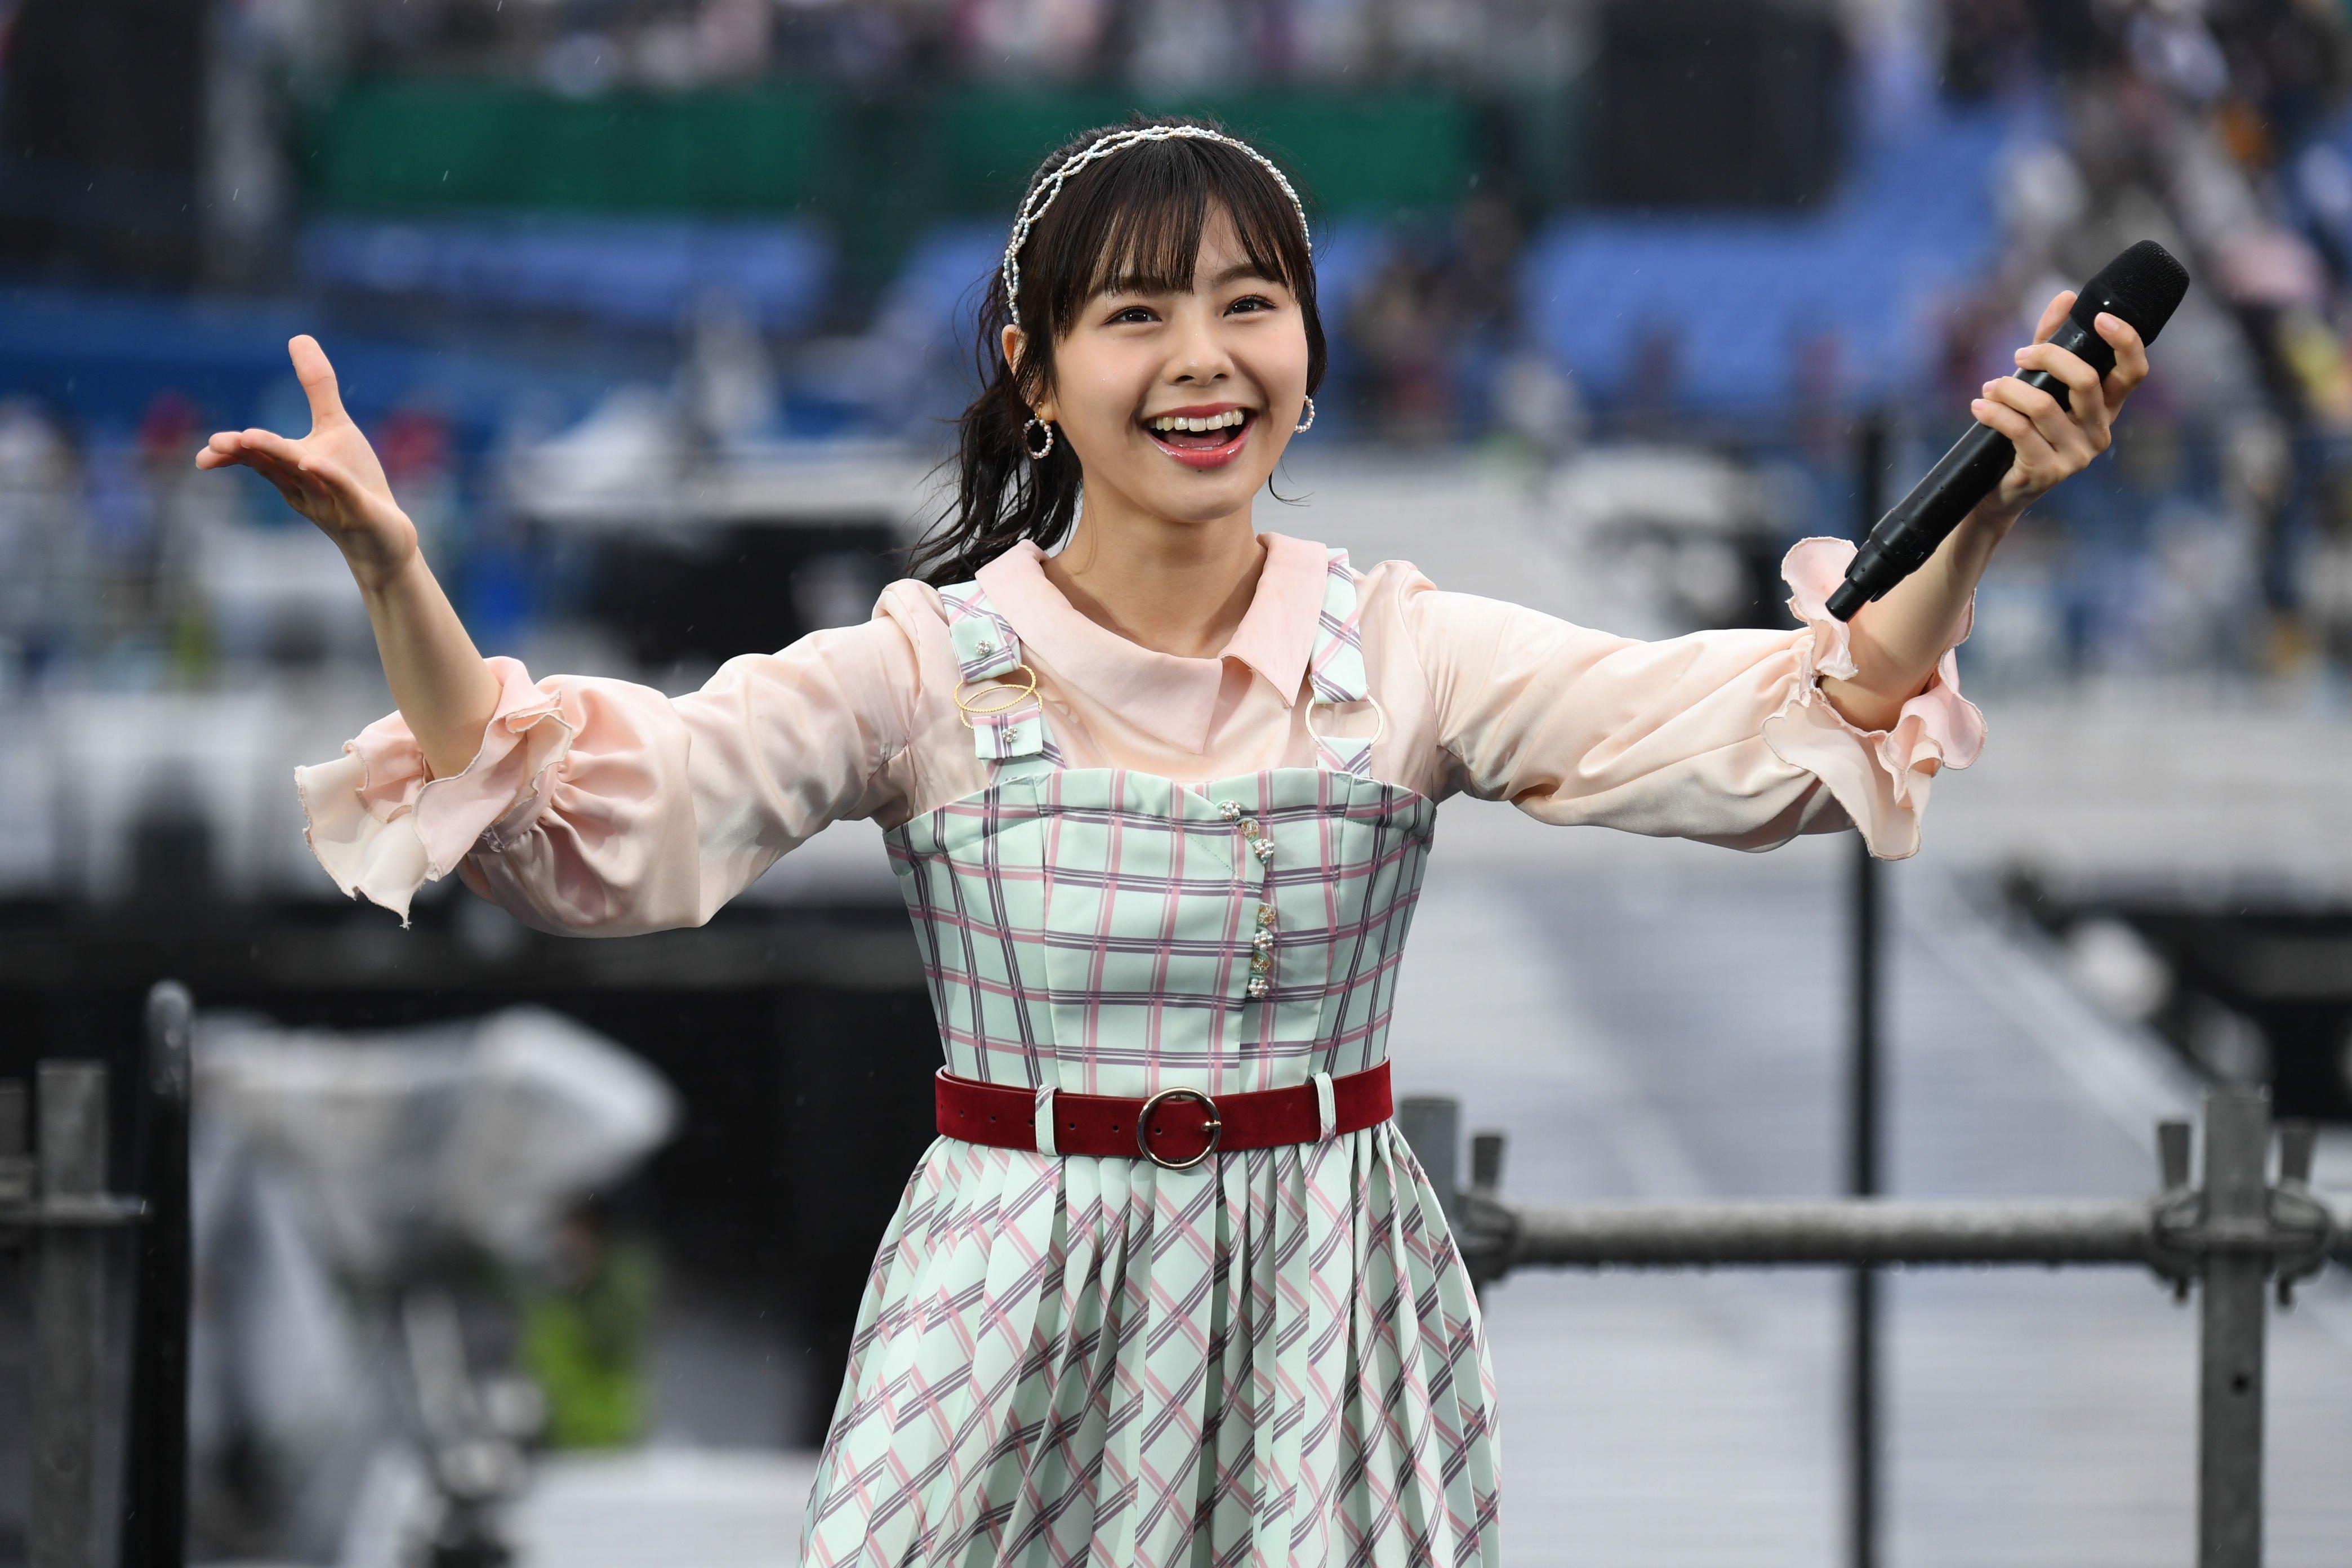 AKB48小嶋真子「笑顔で卒業」AKB48フェスのトリを飾る【写真19枚】の画像015